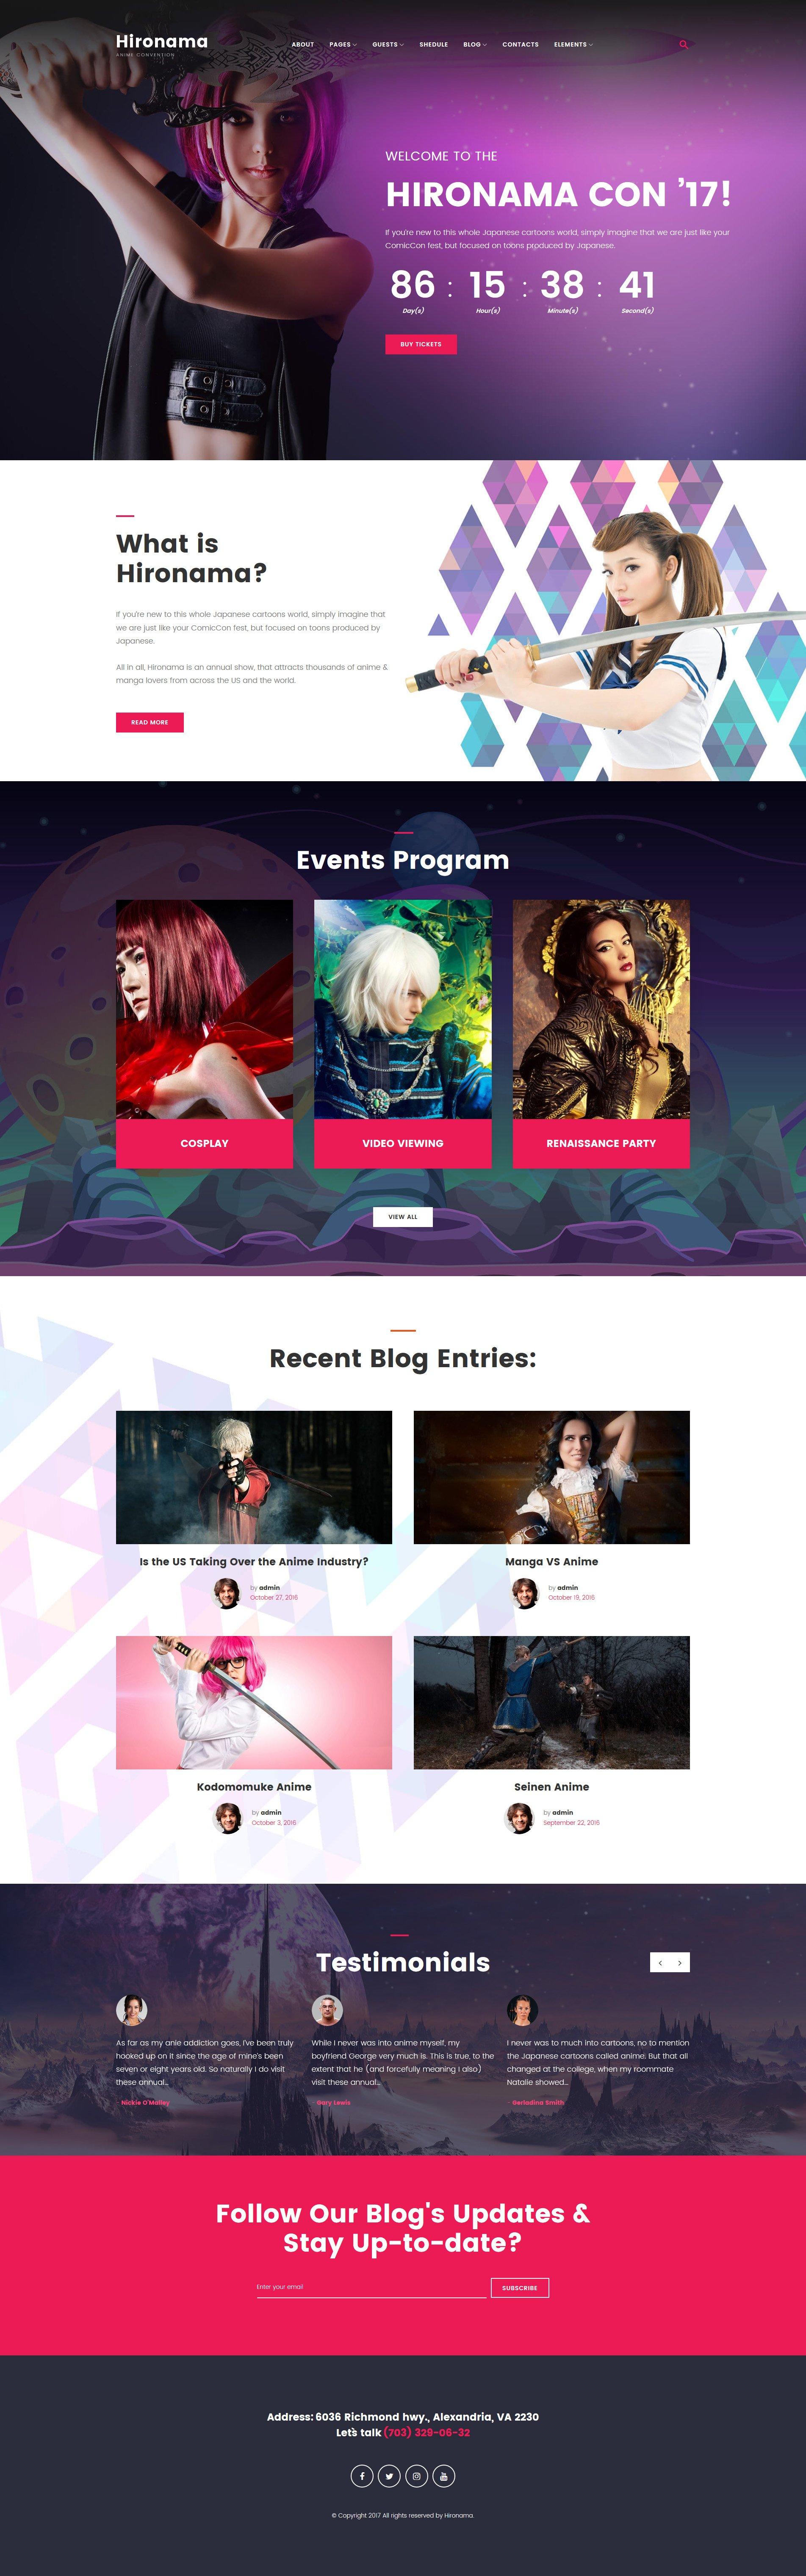 Hironama - Anime Convention WordPress Theme WordPress Theme - screenshot